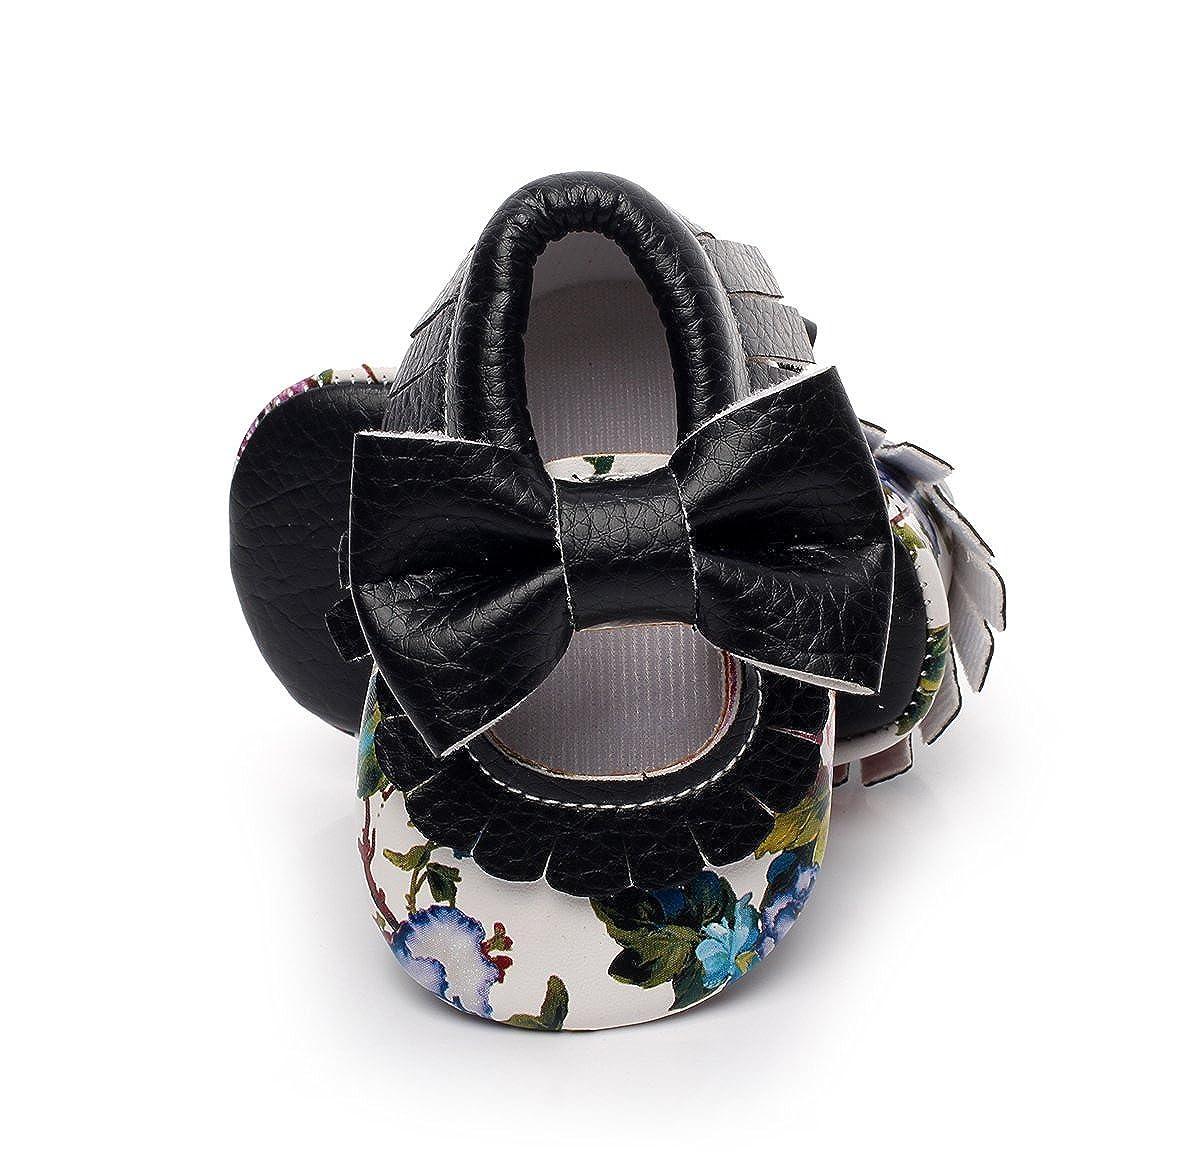 HONGTEYA Infant Toddler Baby Girls Soft Sole Tassel Bowknot Moccasins Floral PU Leather Shoes Mary Jane Flats Sandala